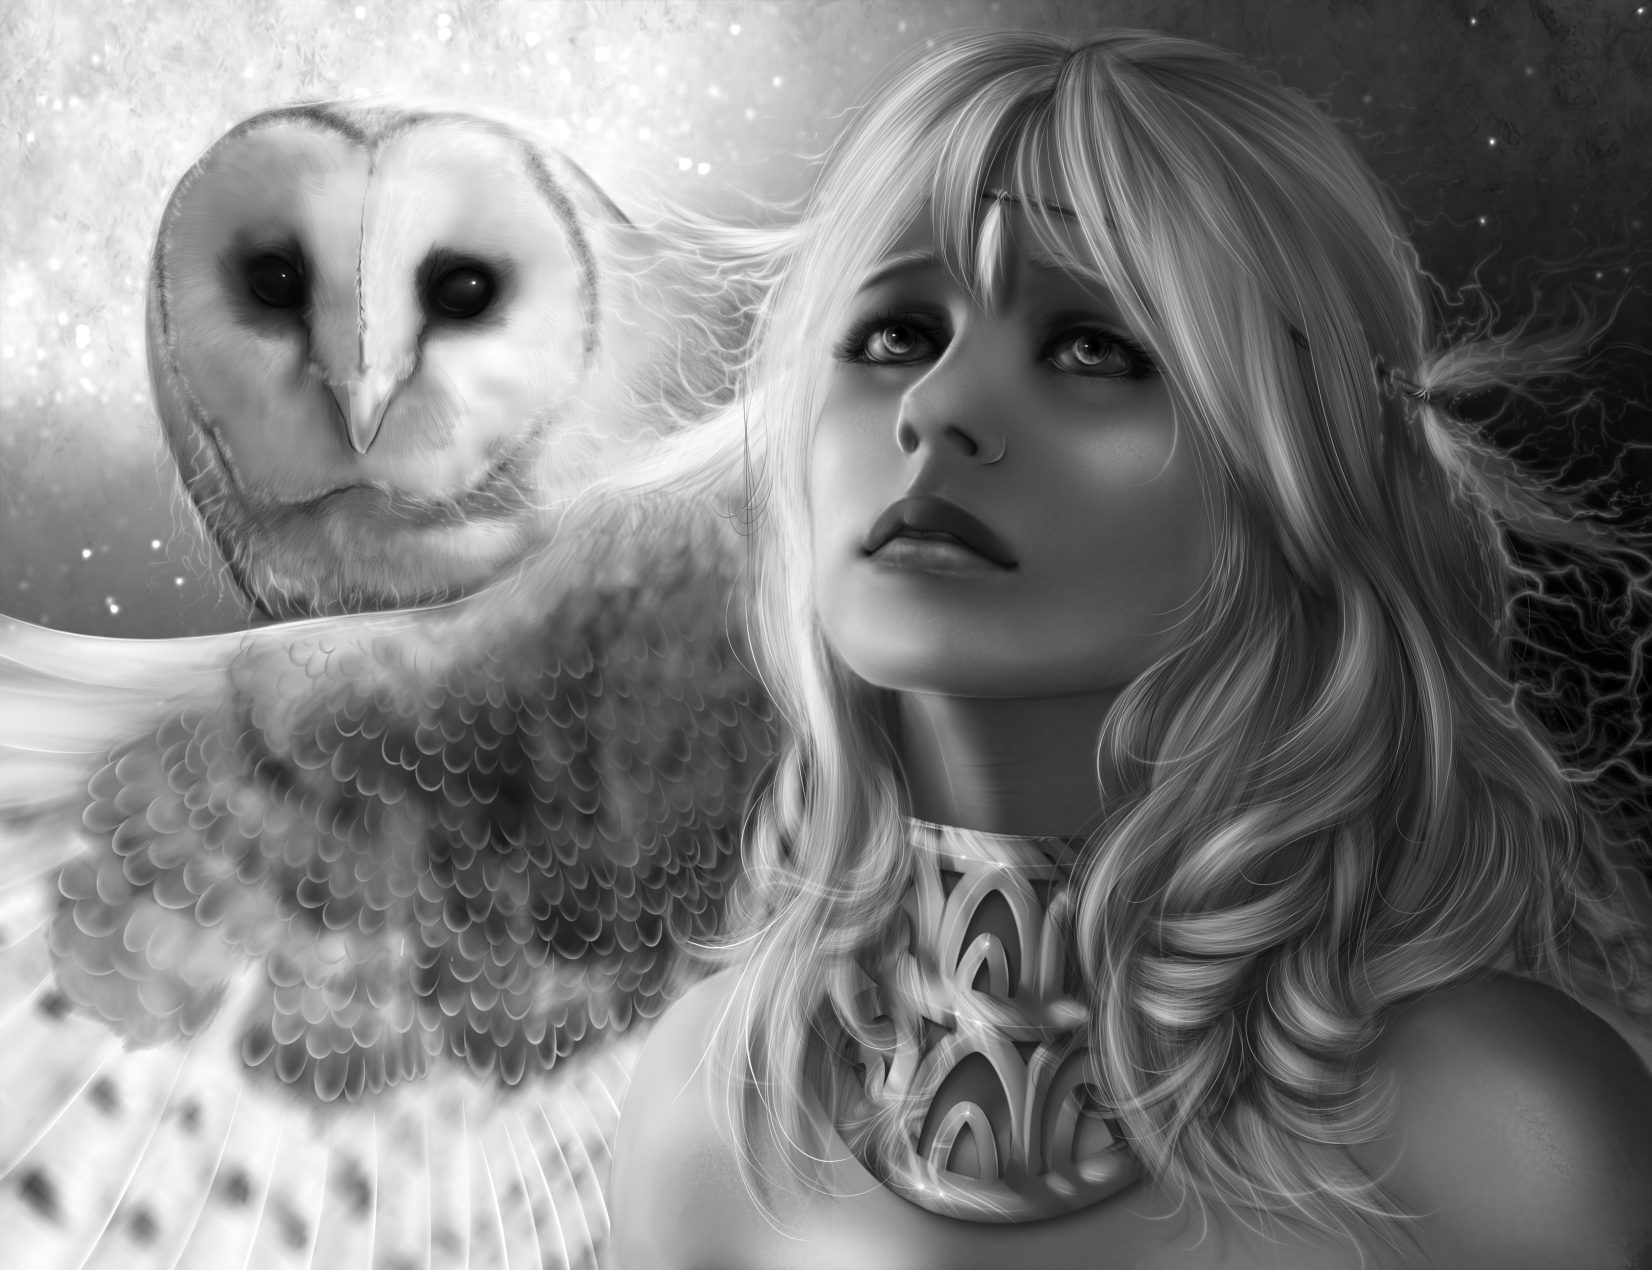 - spirit - by Owlivia